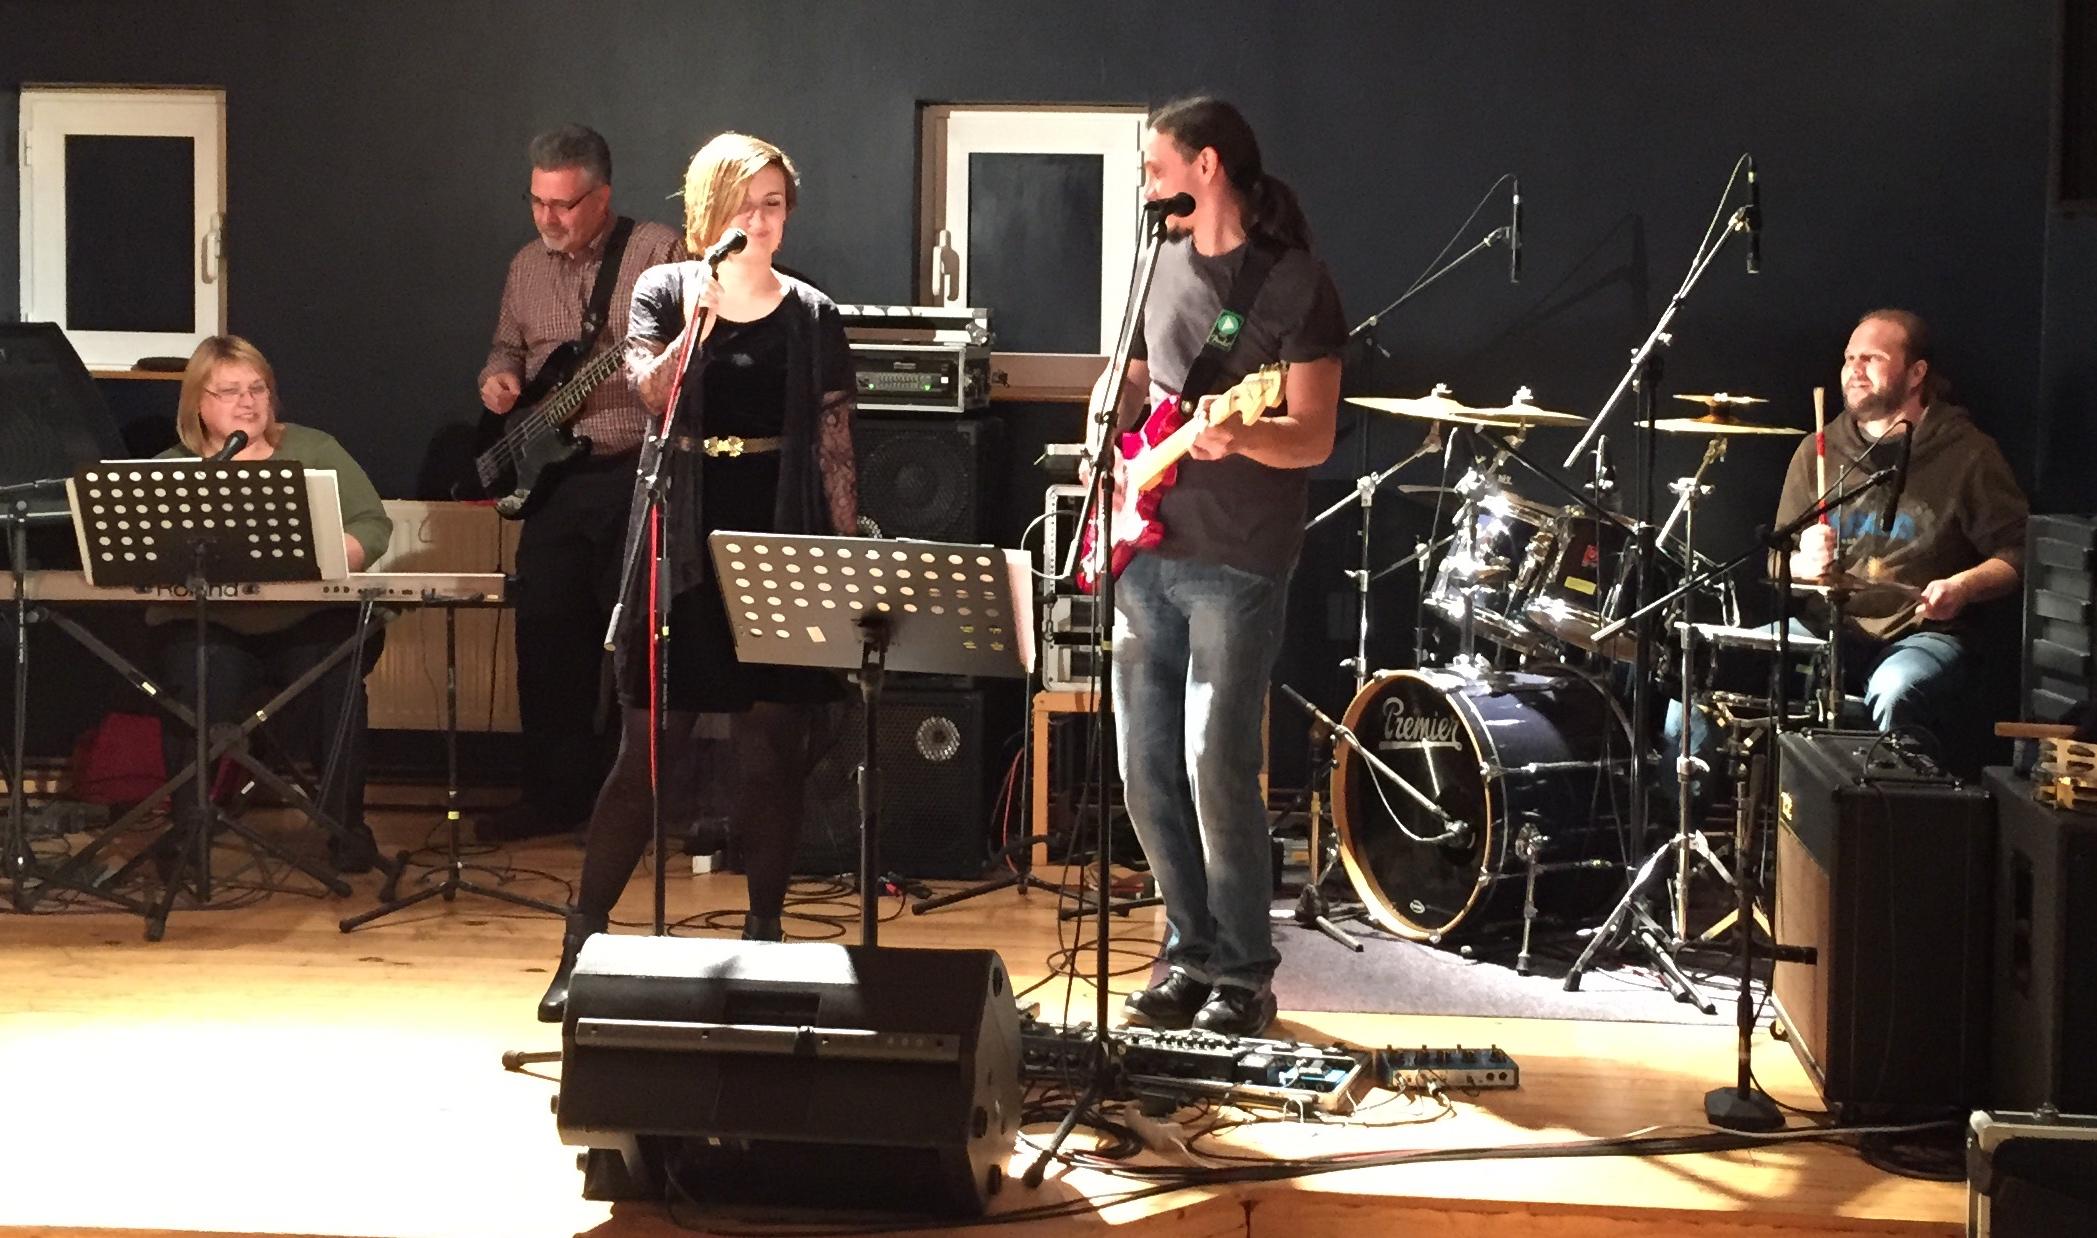 The worship team at Malta church (with Pastor Matt playing bass).